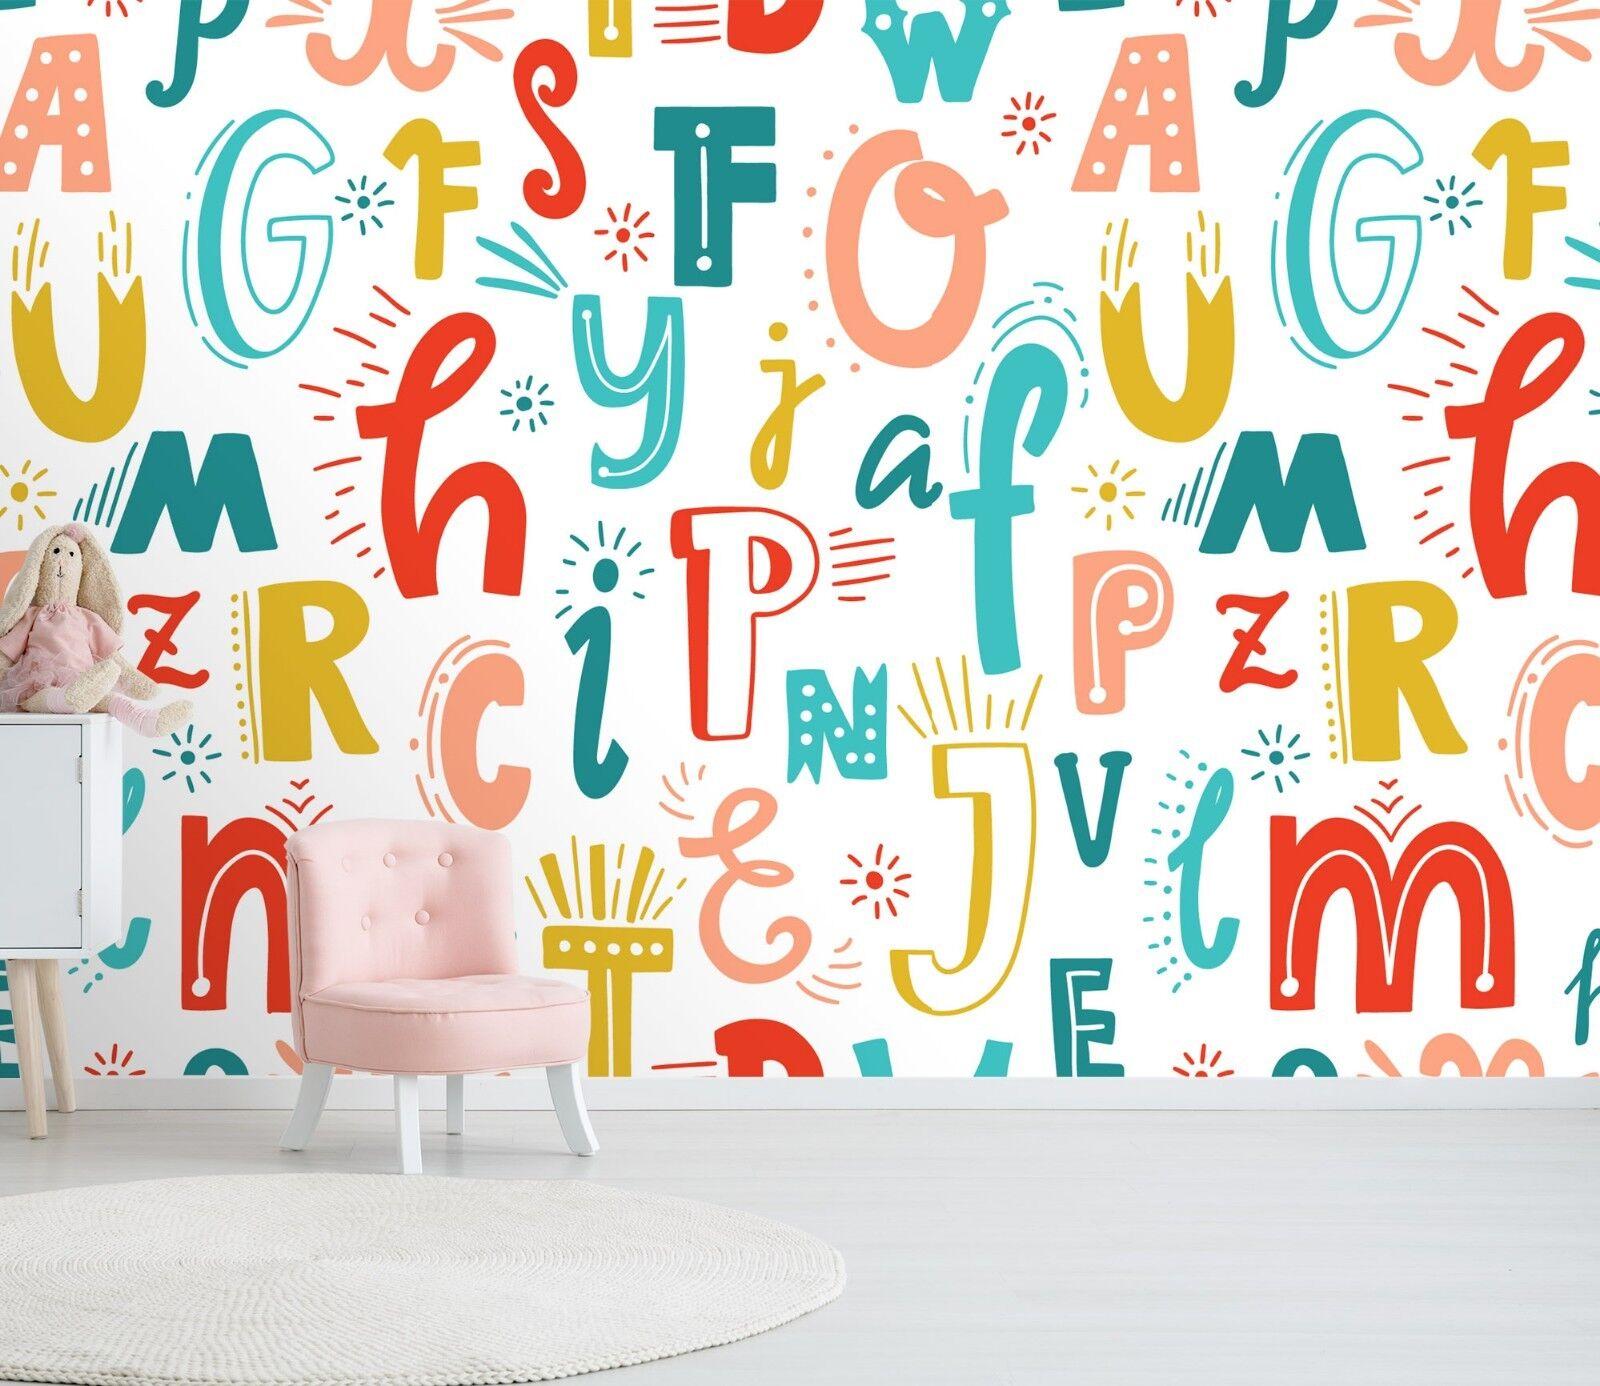 3D Farbeful Text 563 Wallpaper Murals Wall Print Wallpaper Mural AJ WALL UK